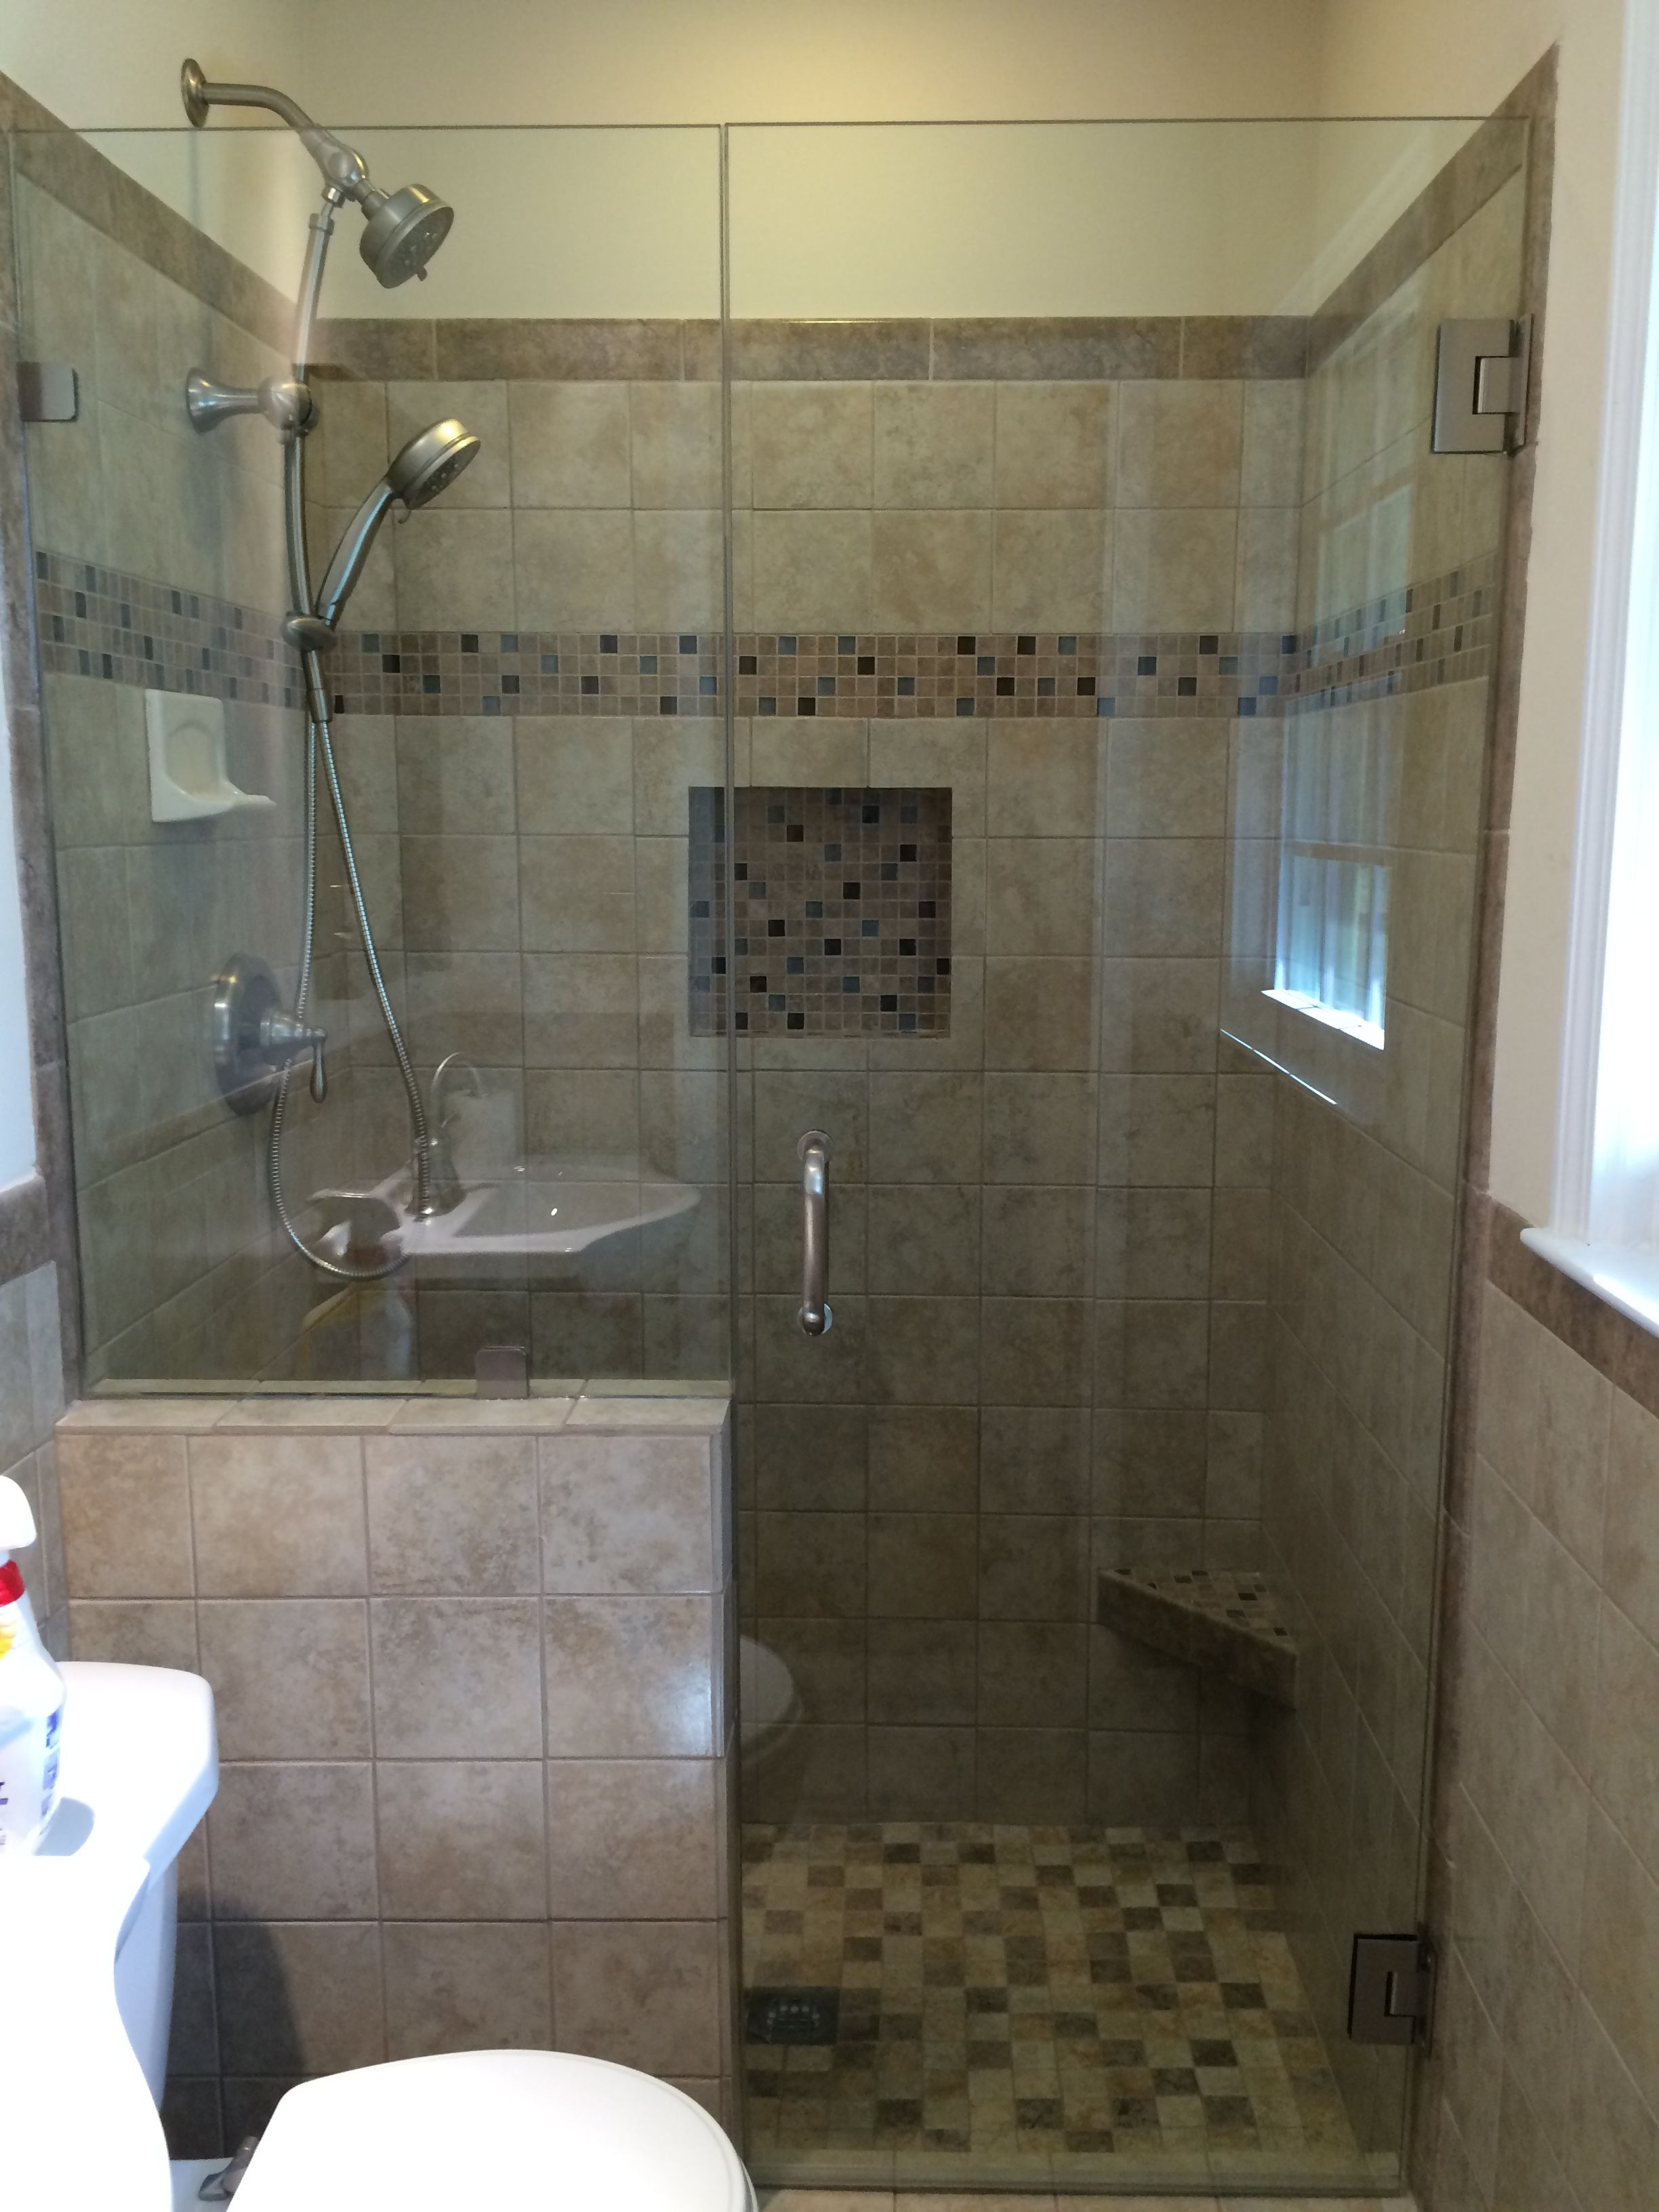 New Modern Spa Bath My Renovations  Pinterest  Spa Baths Endearing Spa Bathroom Remodel Inspiration